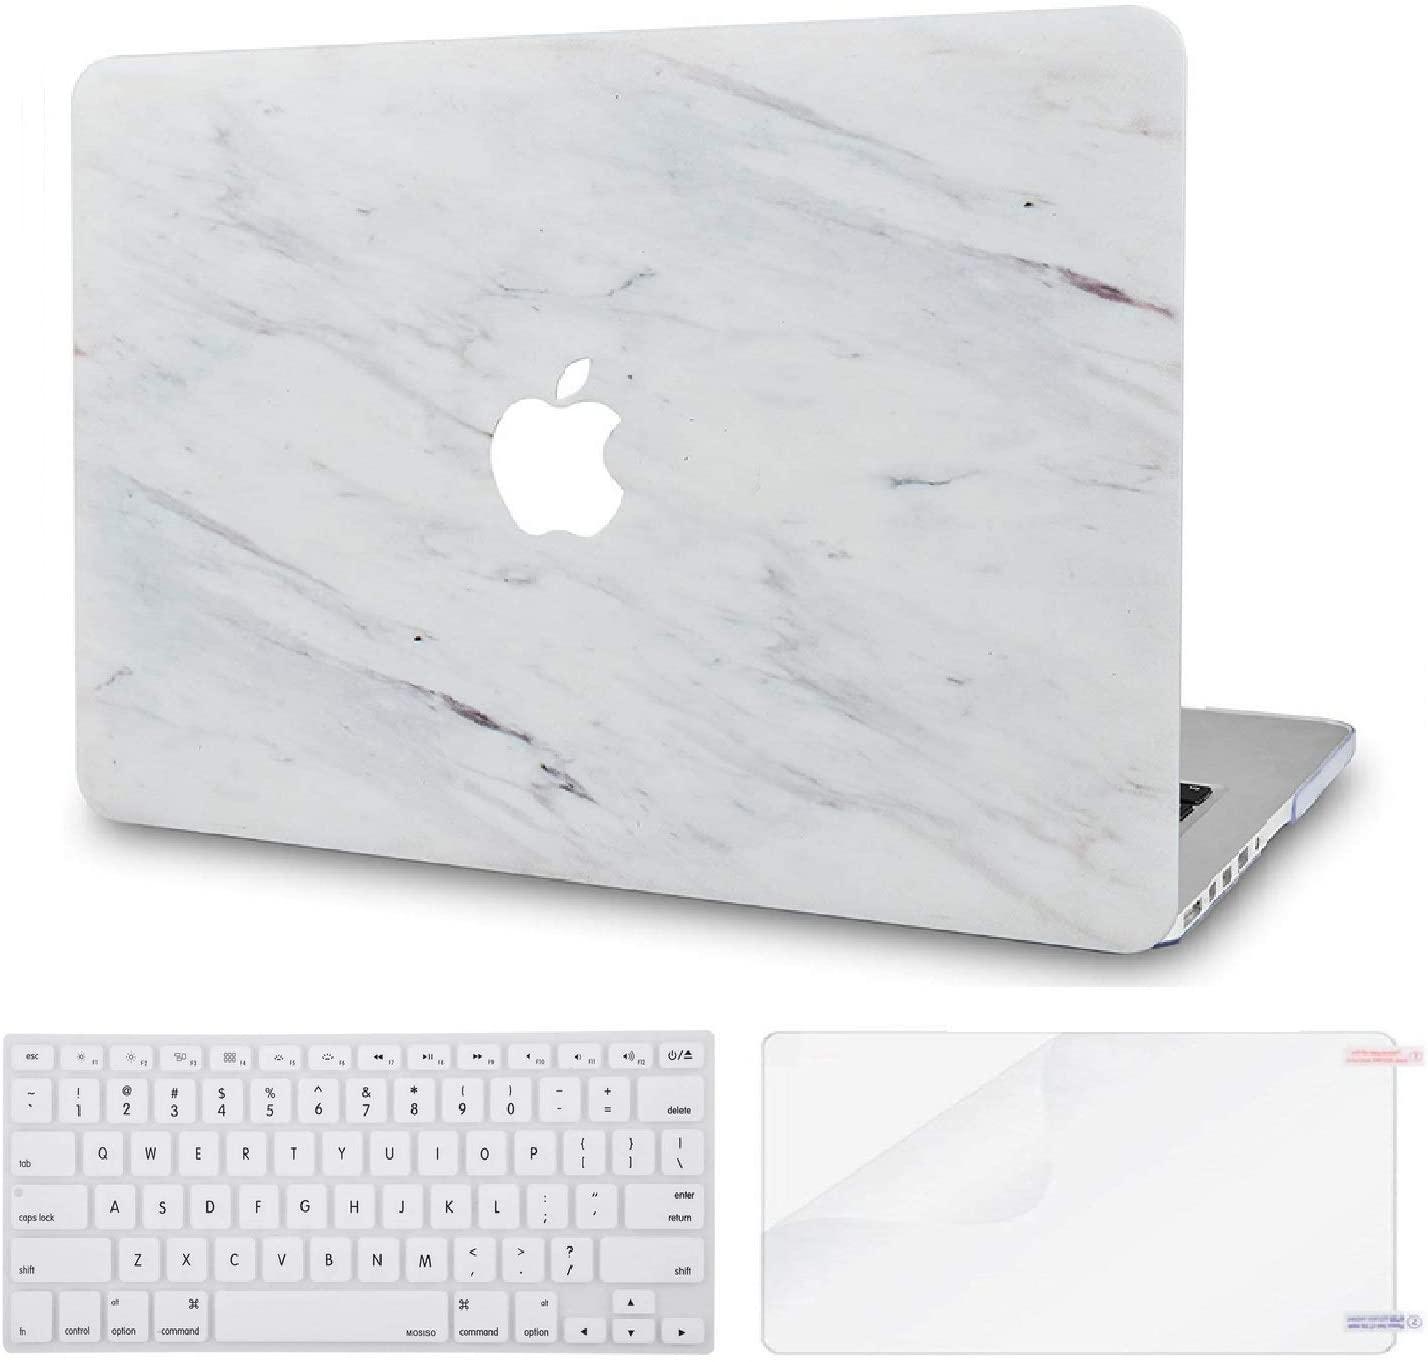 LuvCase 3 in 1 LaptopCase forMacBookPro 13